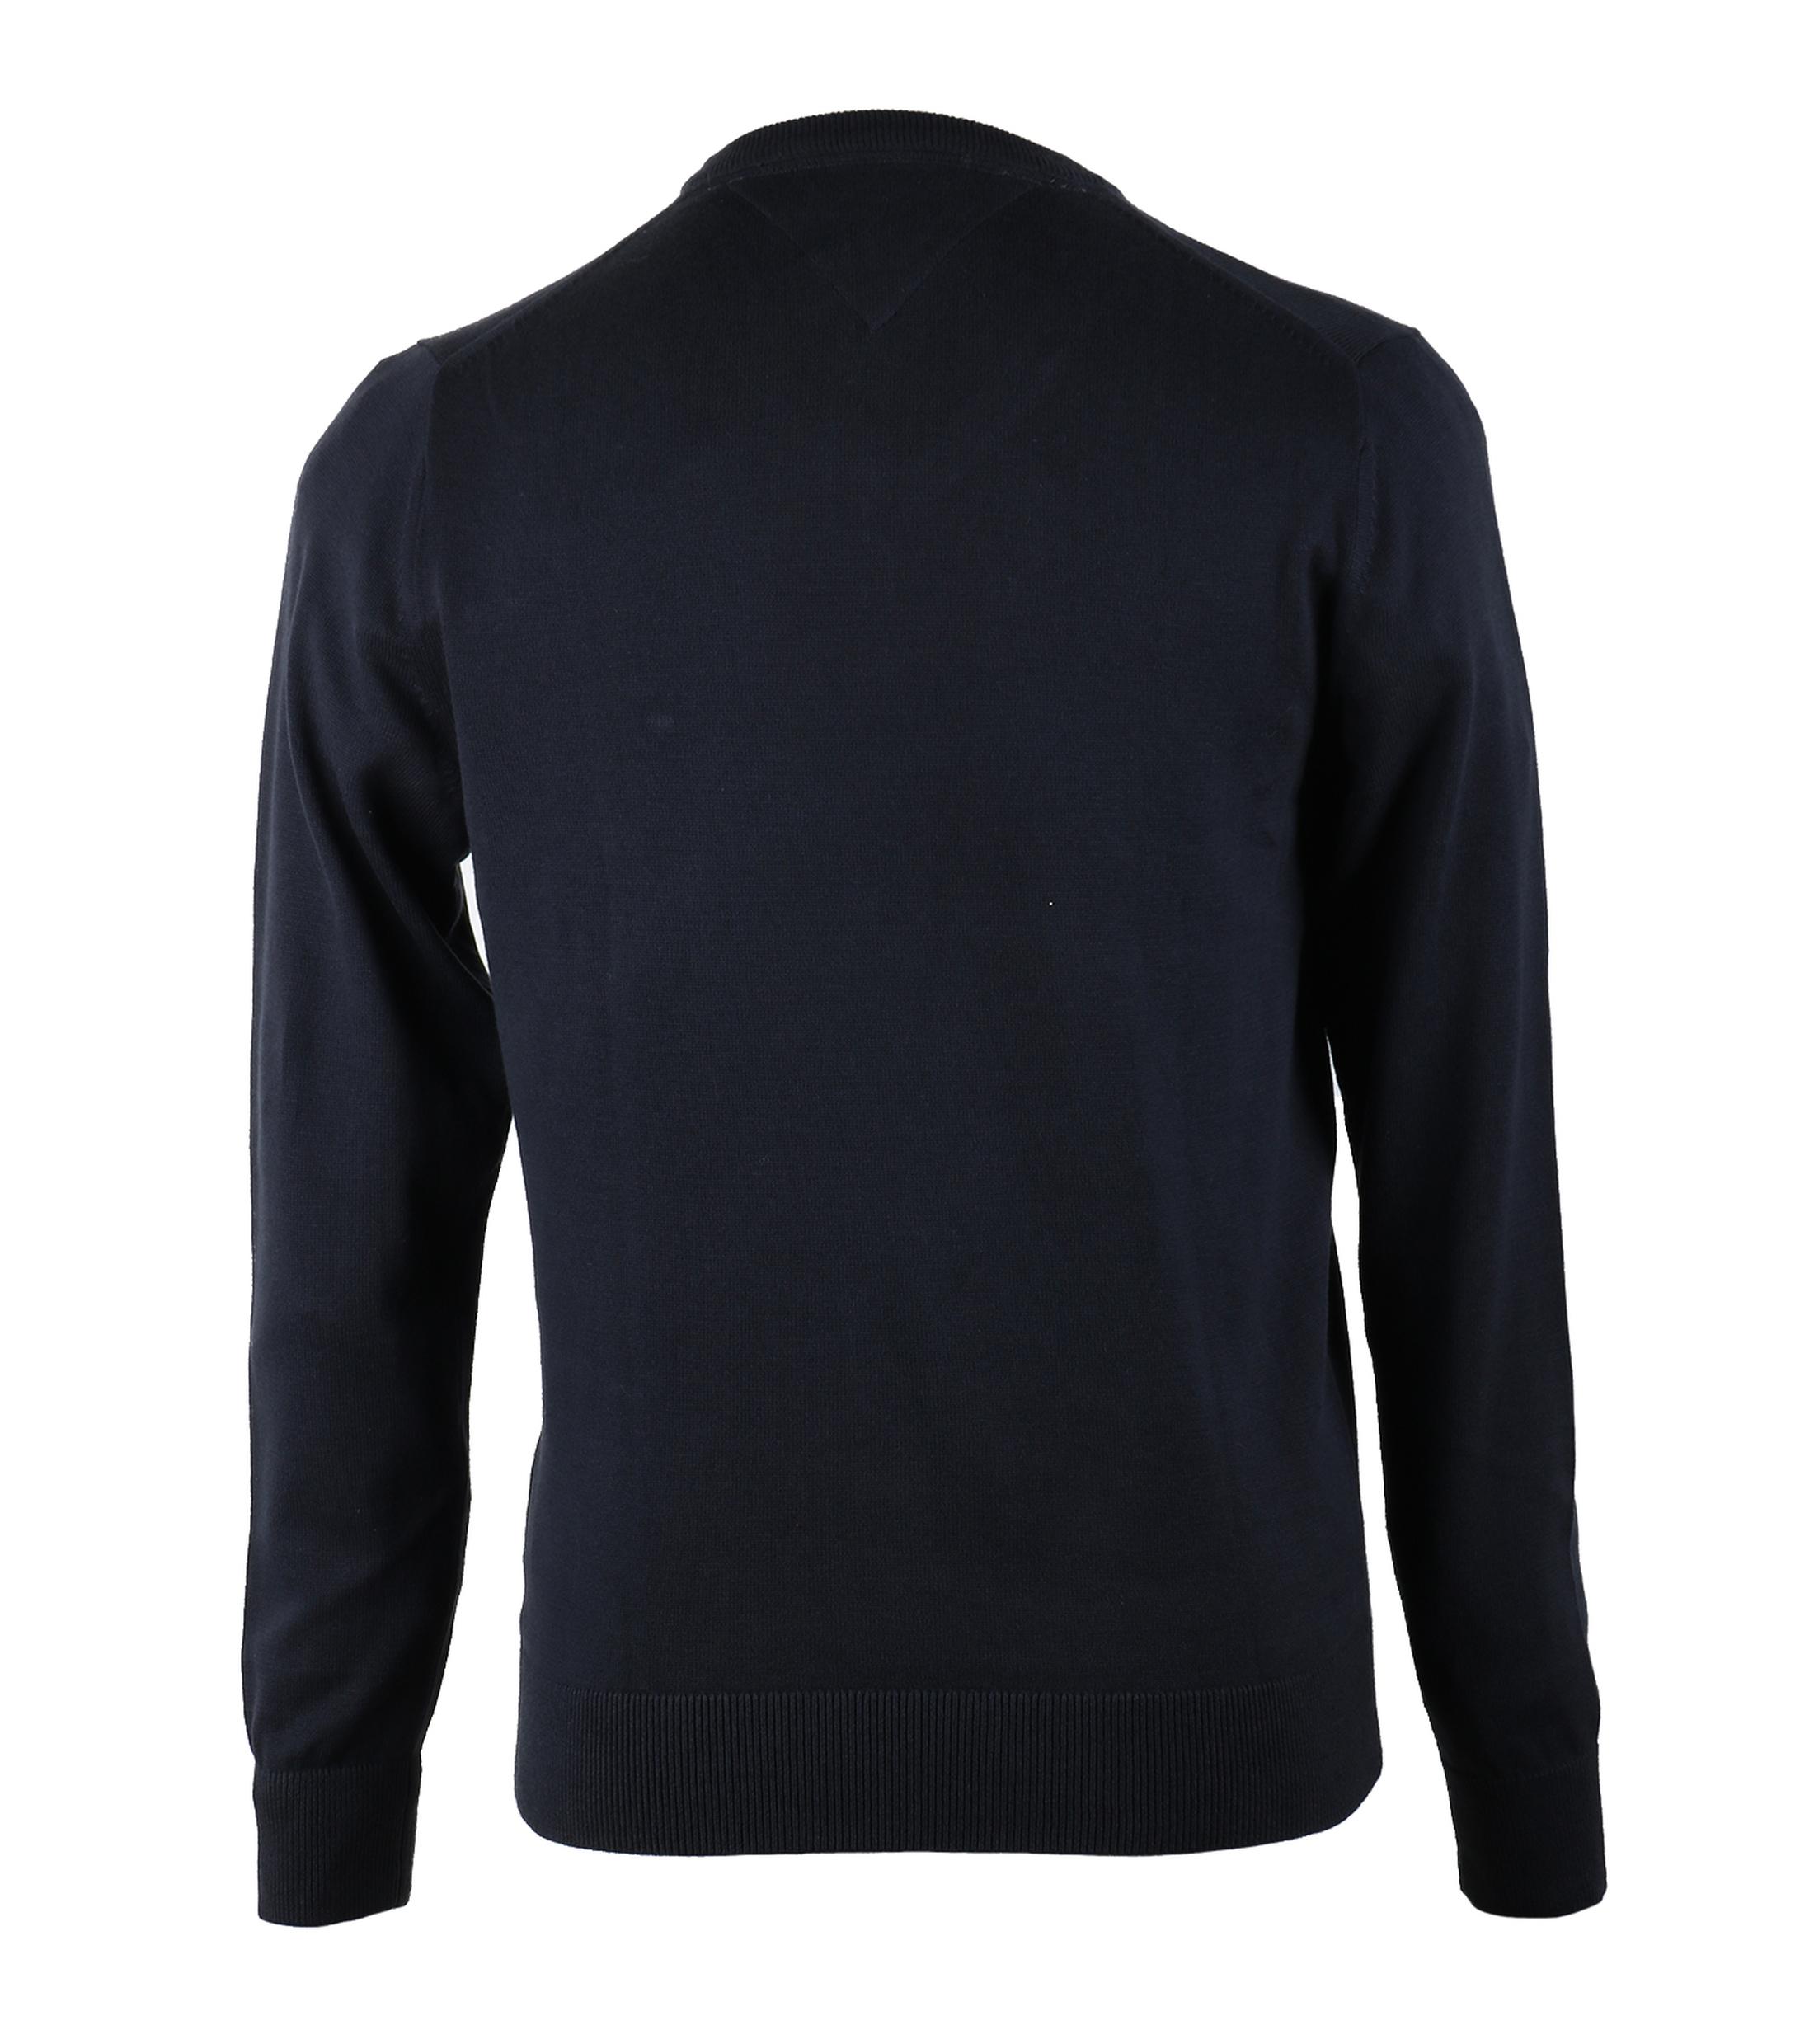 Tommy Hilfiger Pullover V-Hals Donkerblauw foto 1